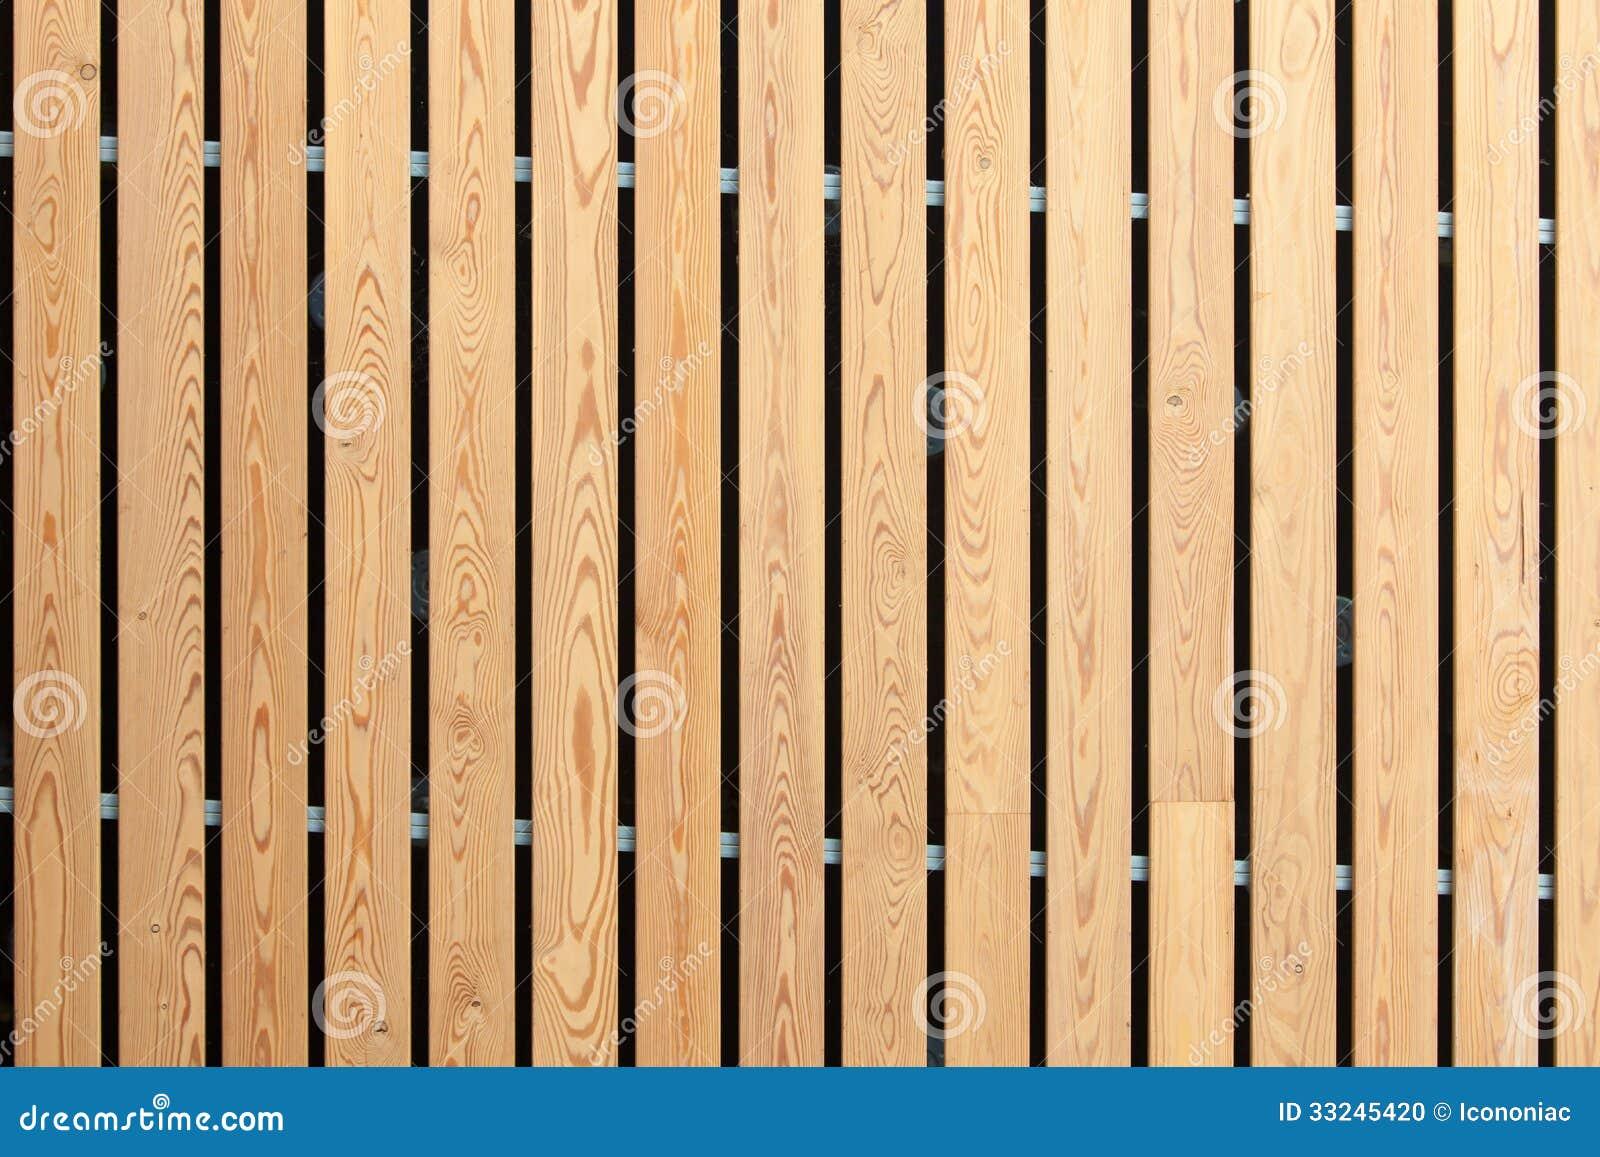 Wood Stripes Facade Building Decor Stock Photo Image